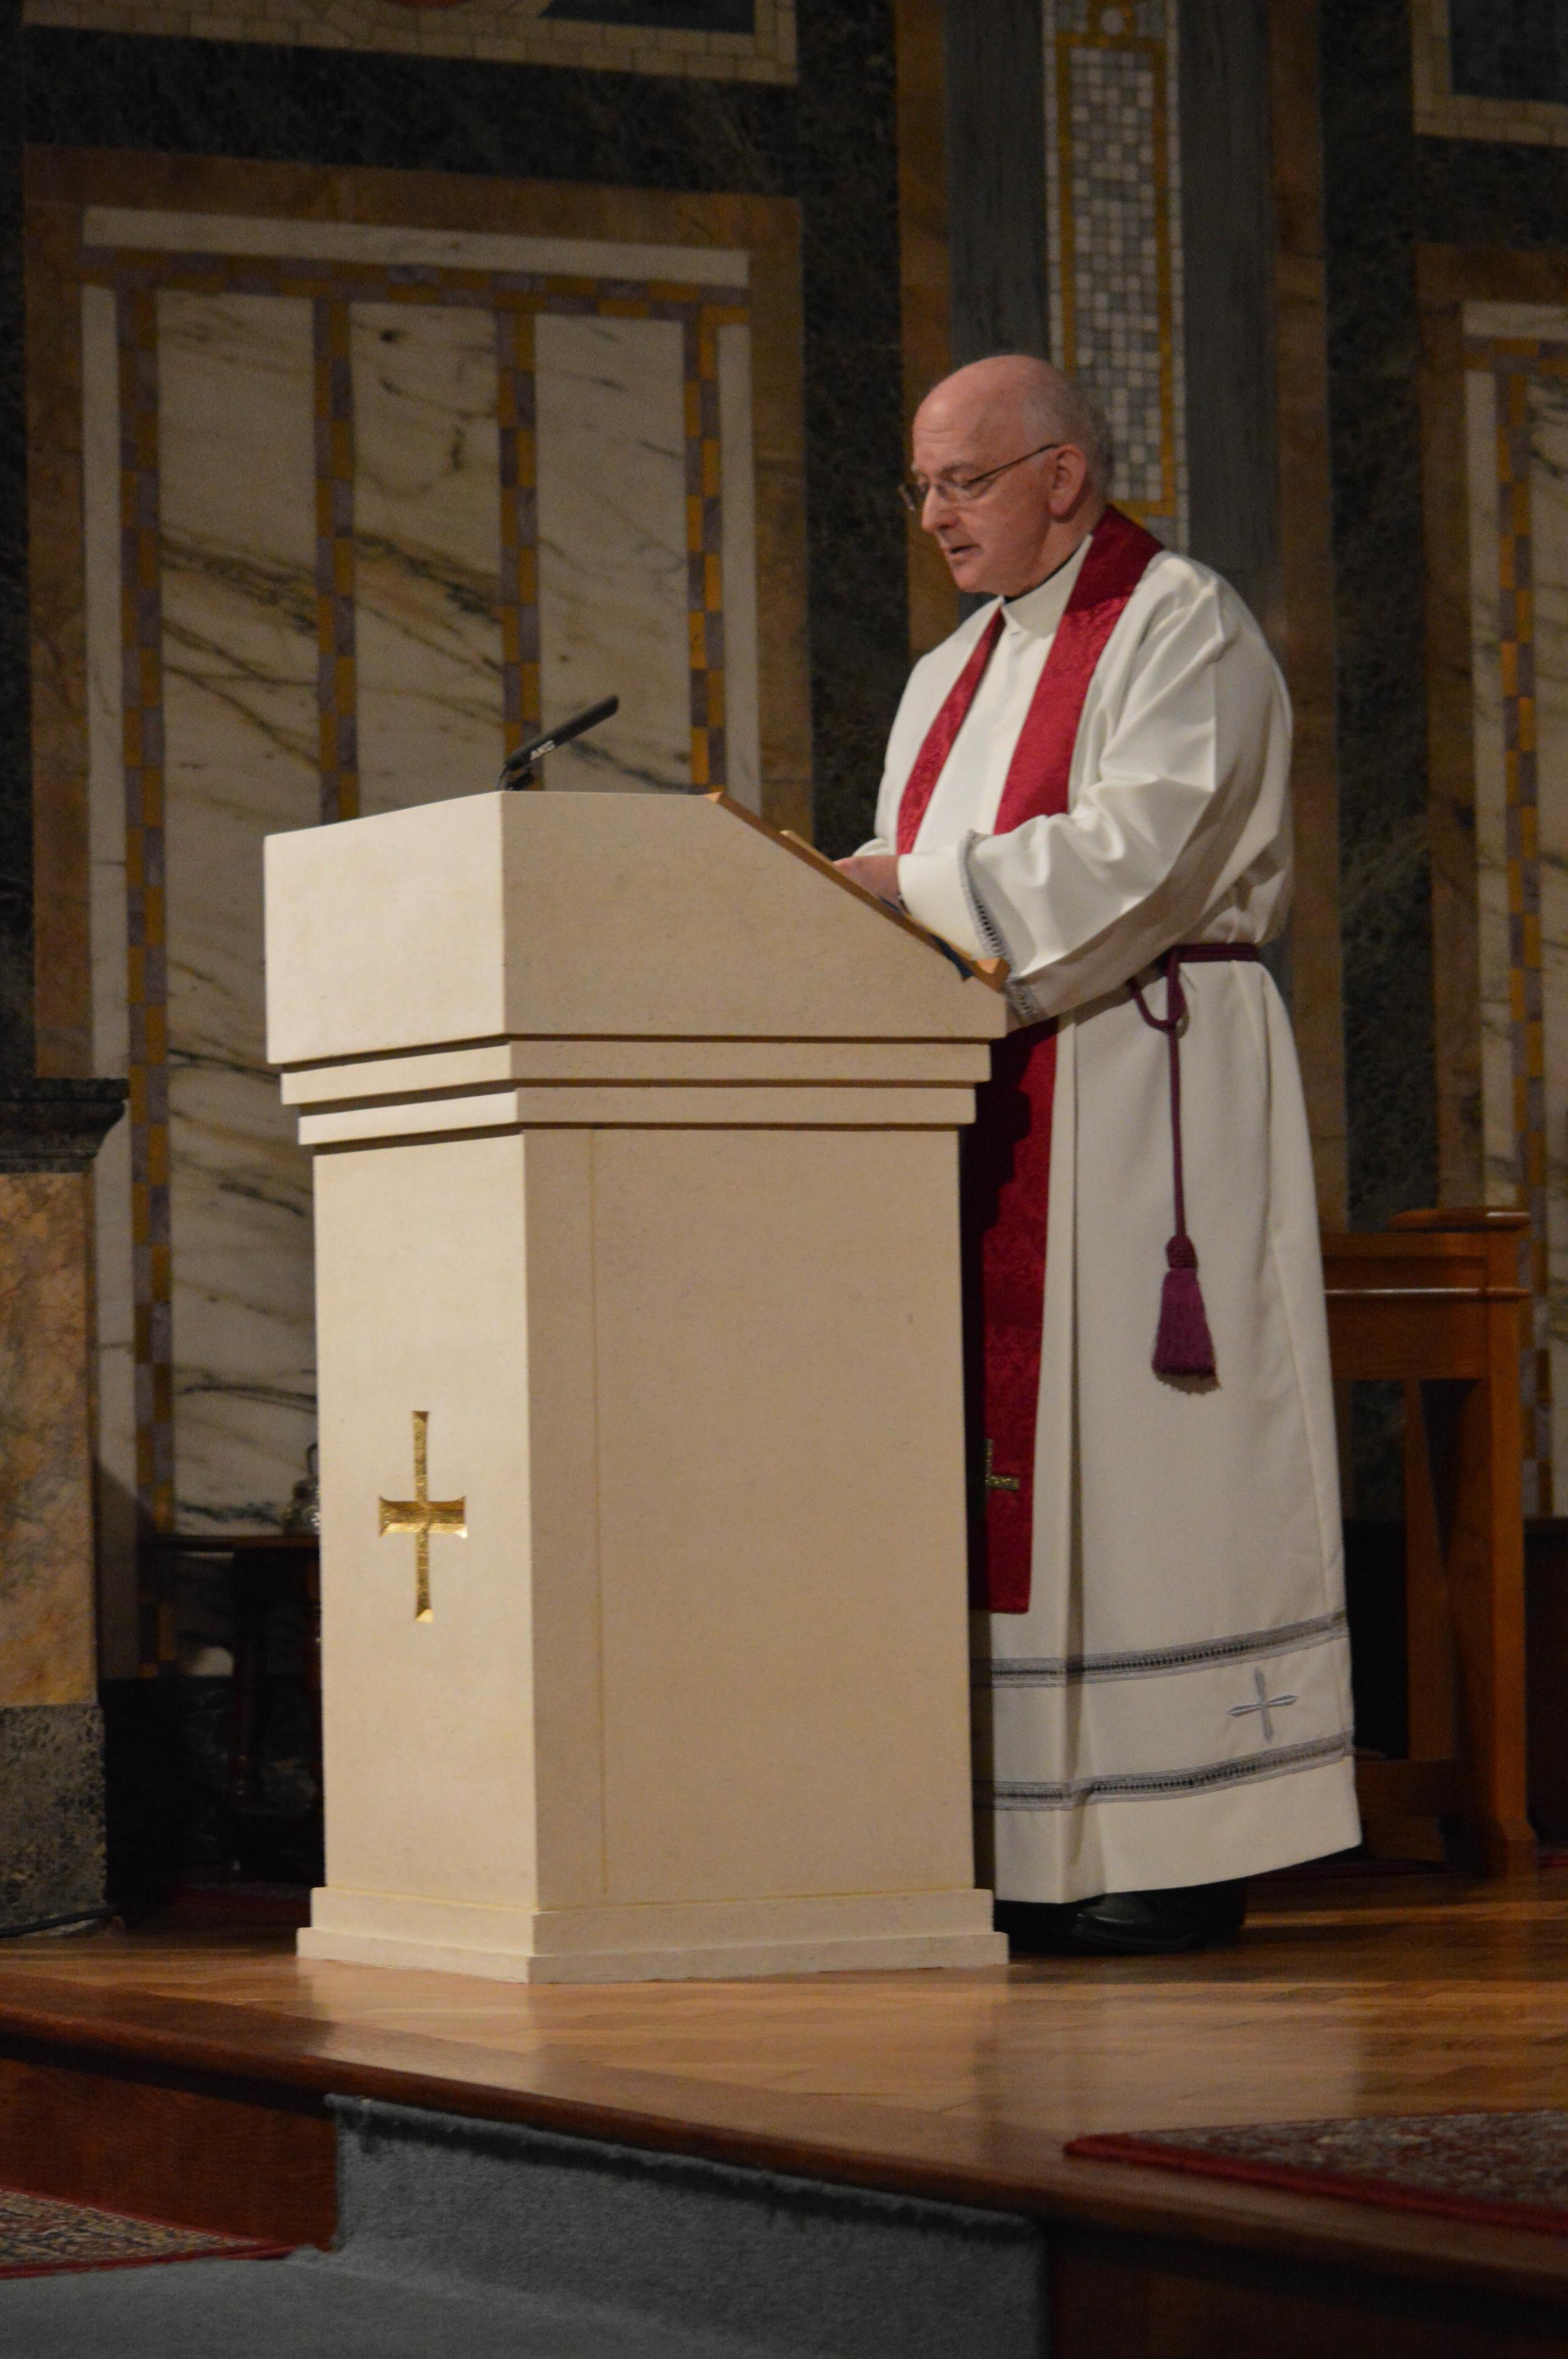 Fr James Hanvey SJ